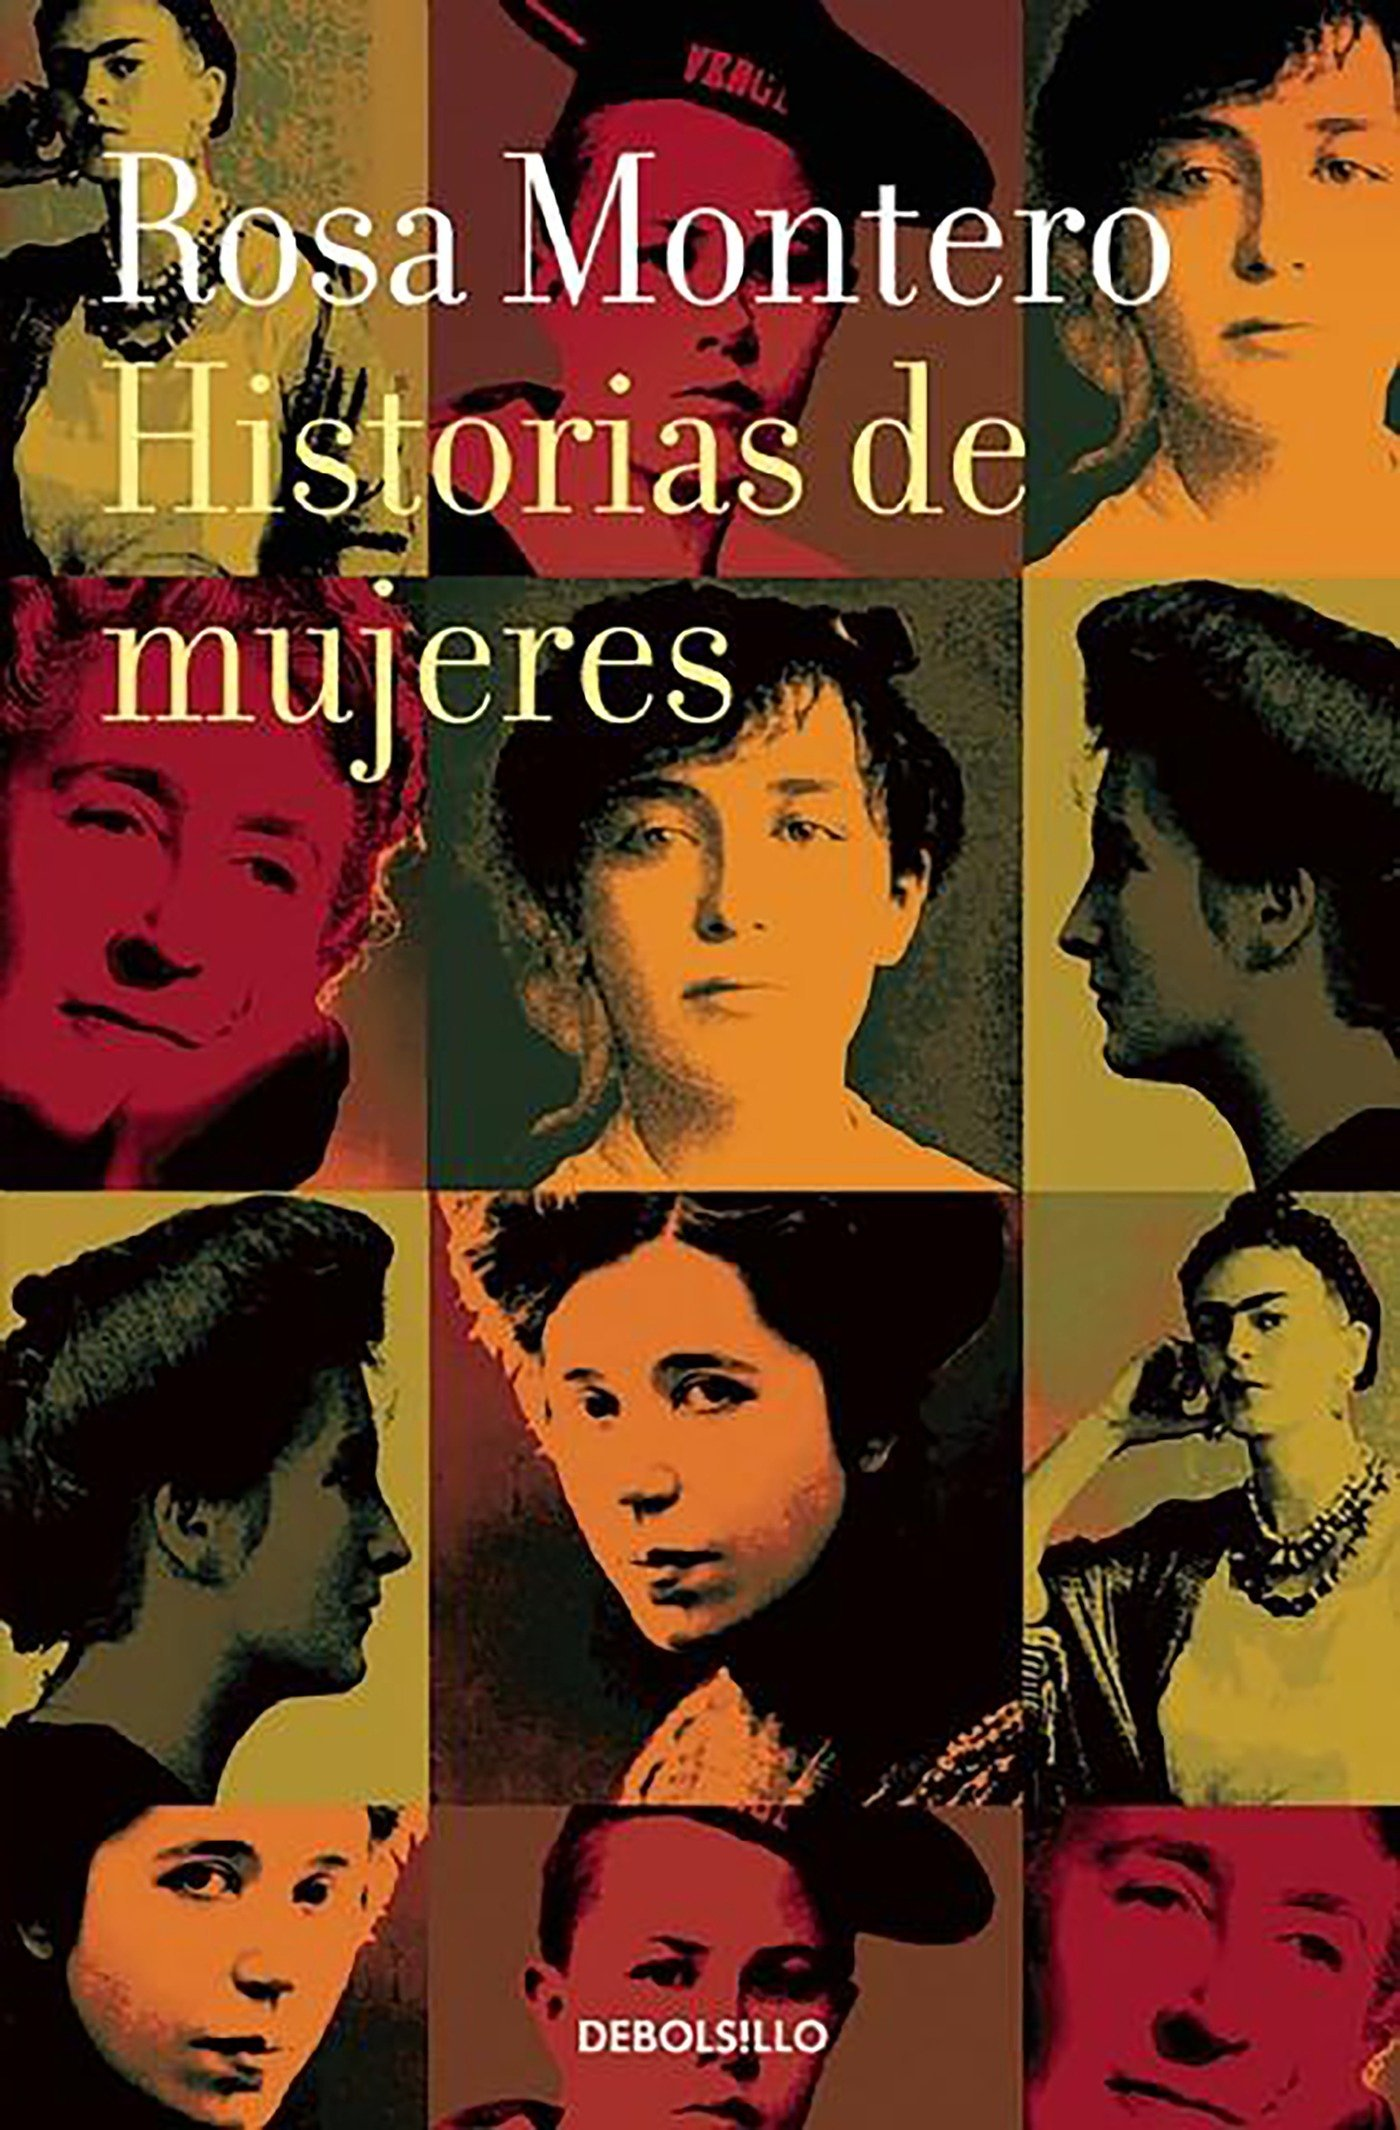 Historias de mujeres (BEST SELLER) Tapa blanda – 22 oct 2015 Rosa Montero Debolsillo 8490629250 Biography - 19th century